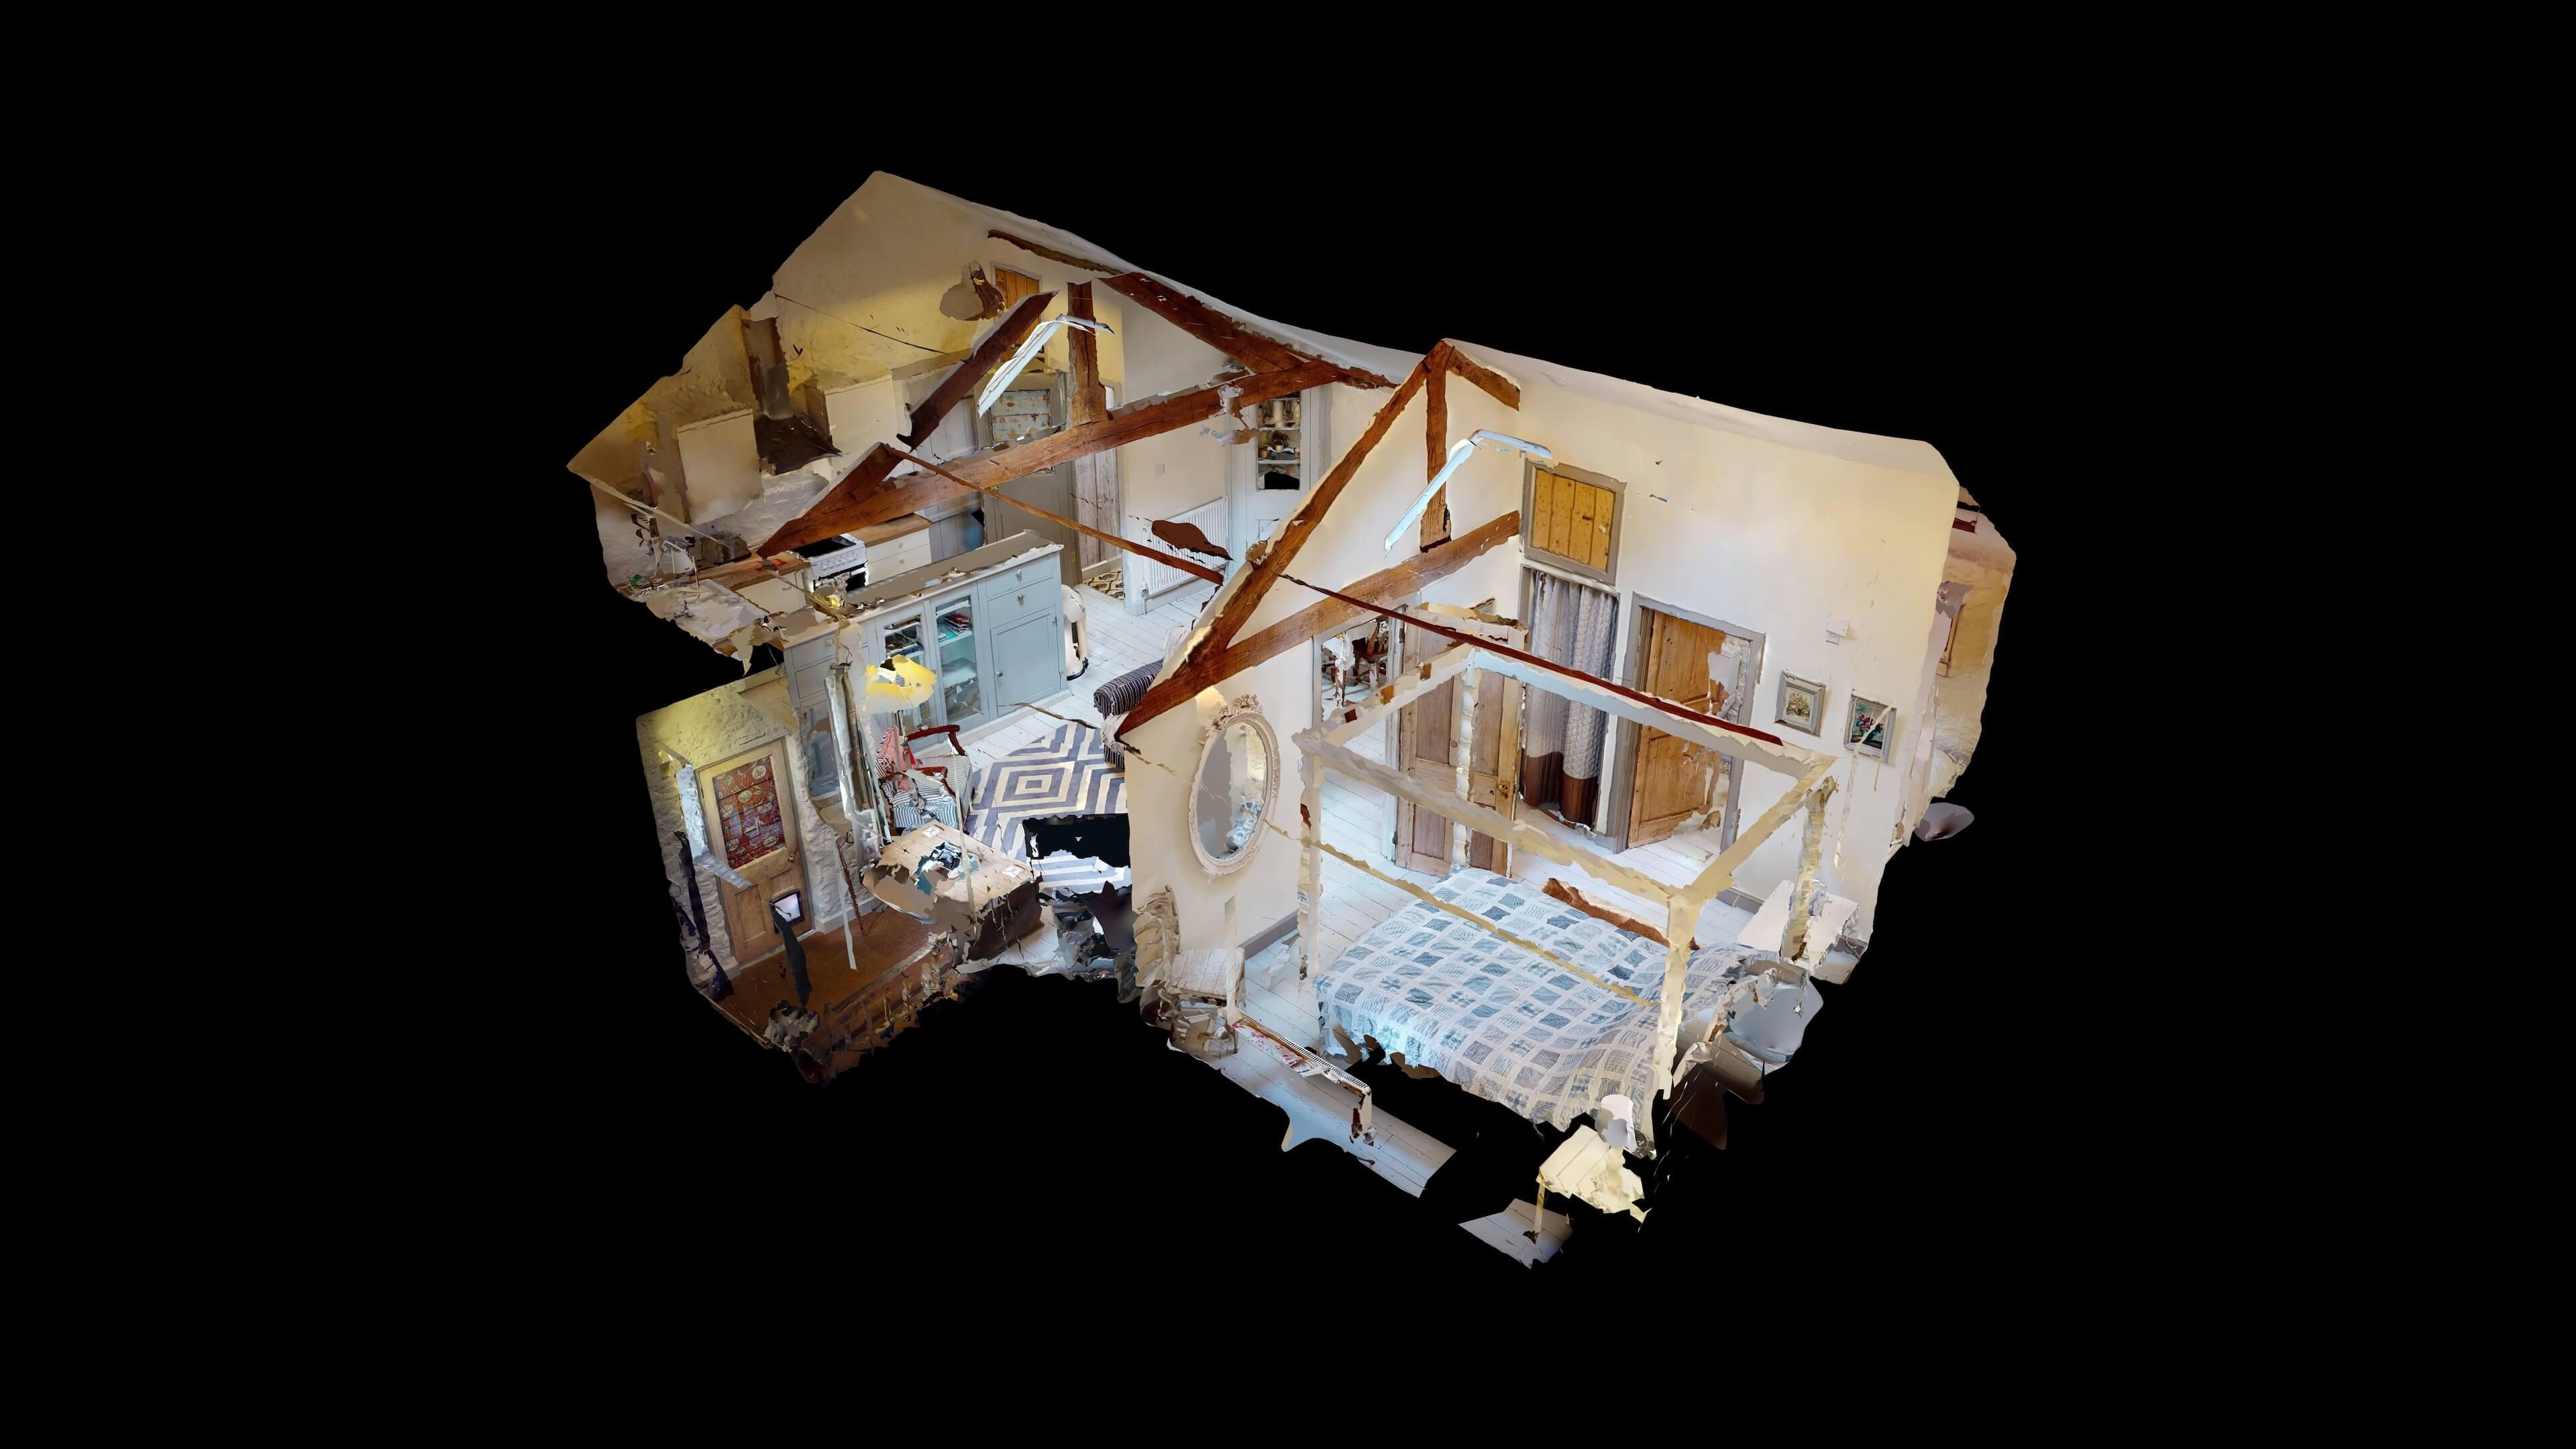 The Hayloft Dollhouse View